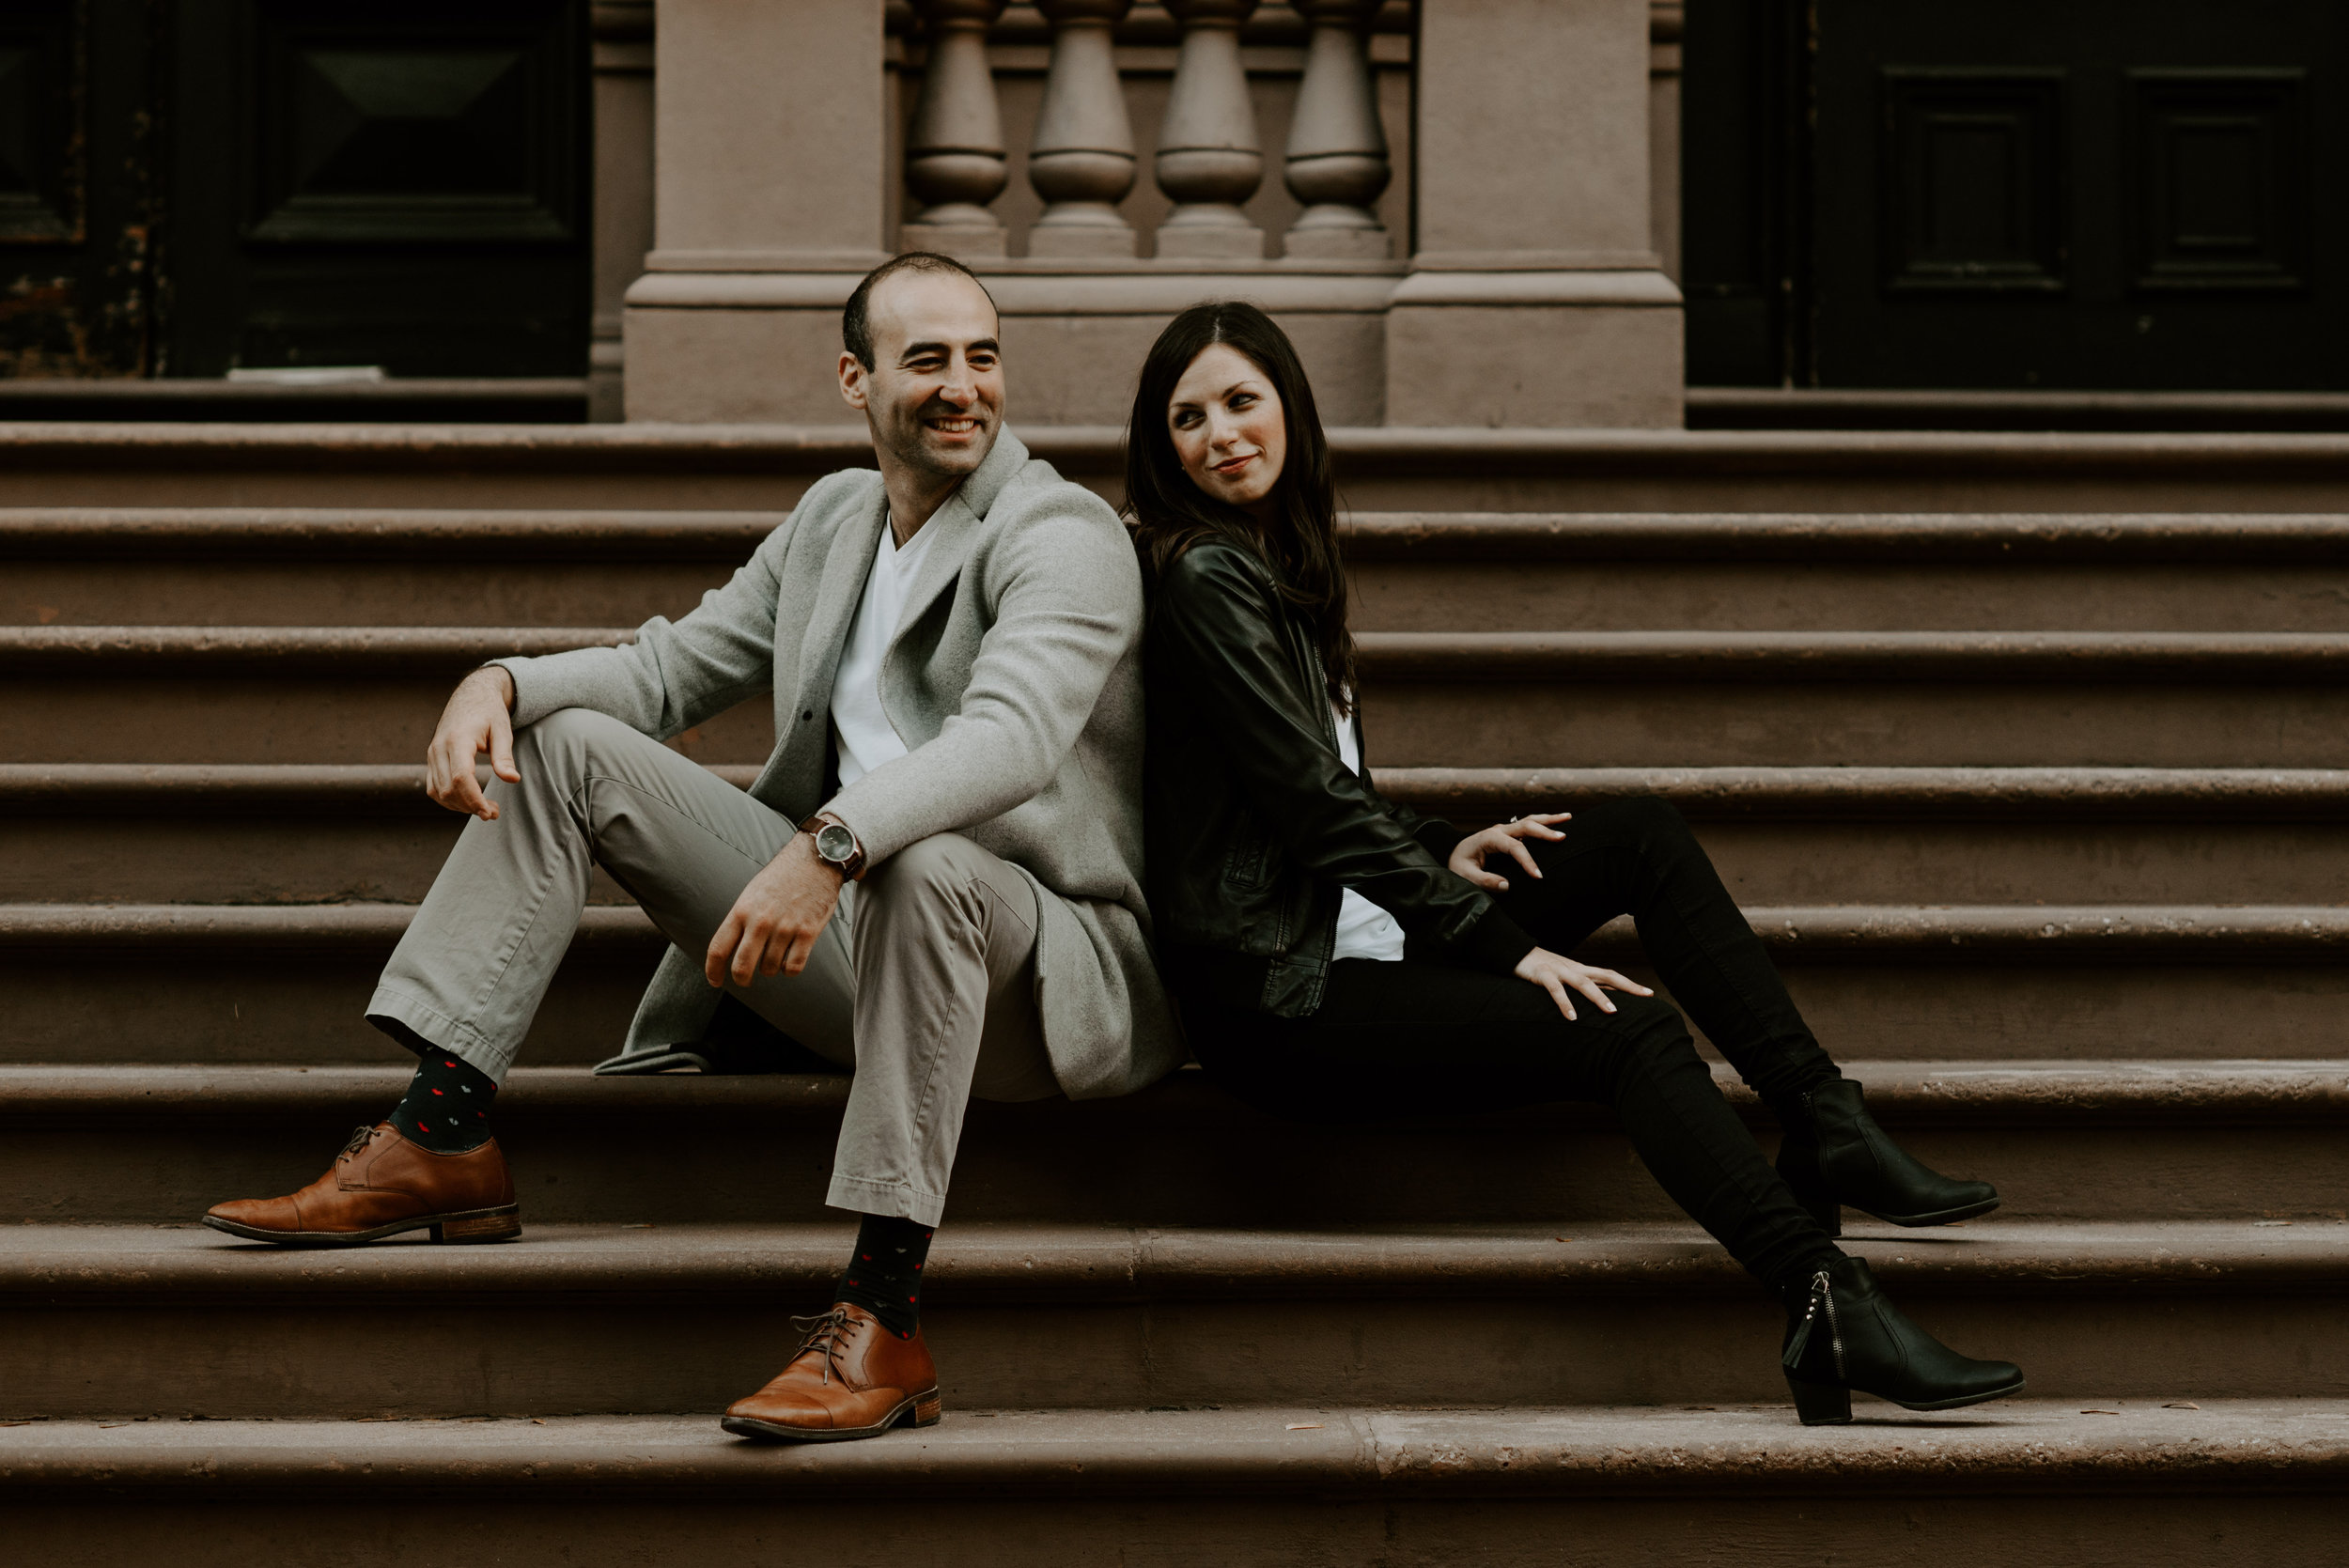 Dramatic and Moody Public Gardens, Boston Engagement Session | Boston Wedding Photographer | Madeline Rose Photography Co.